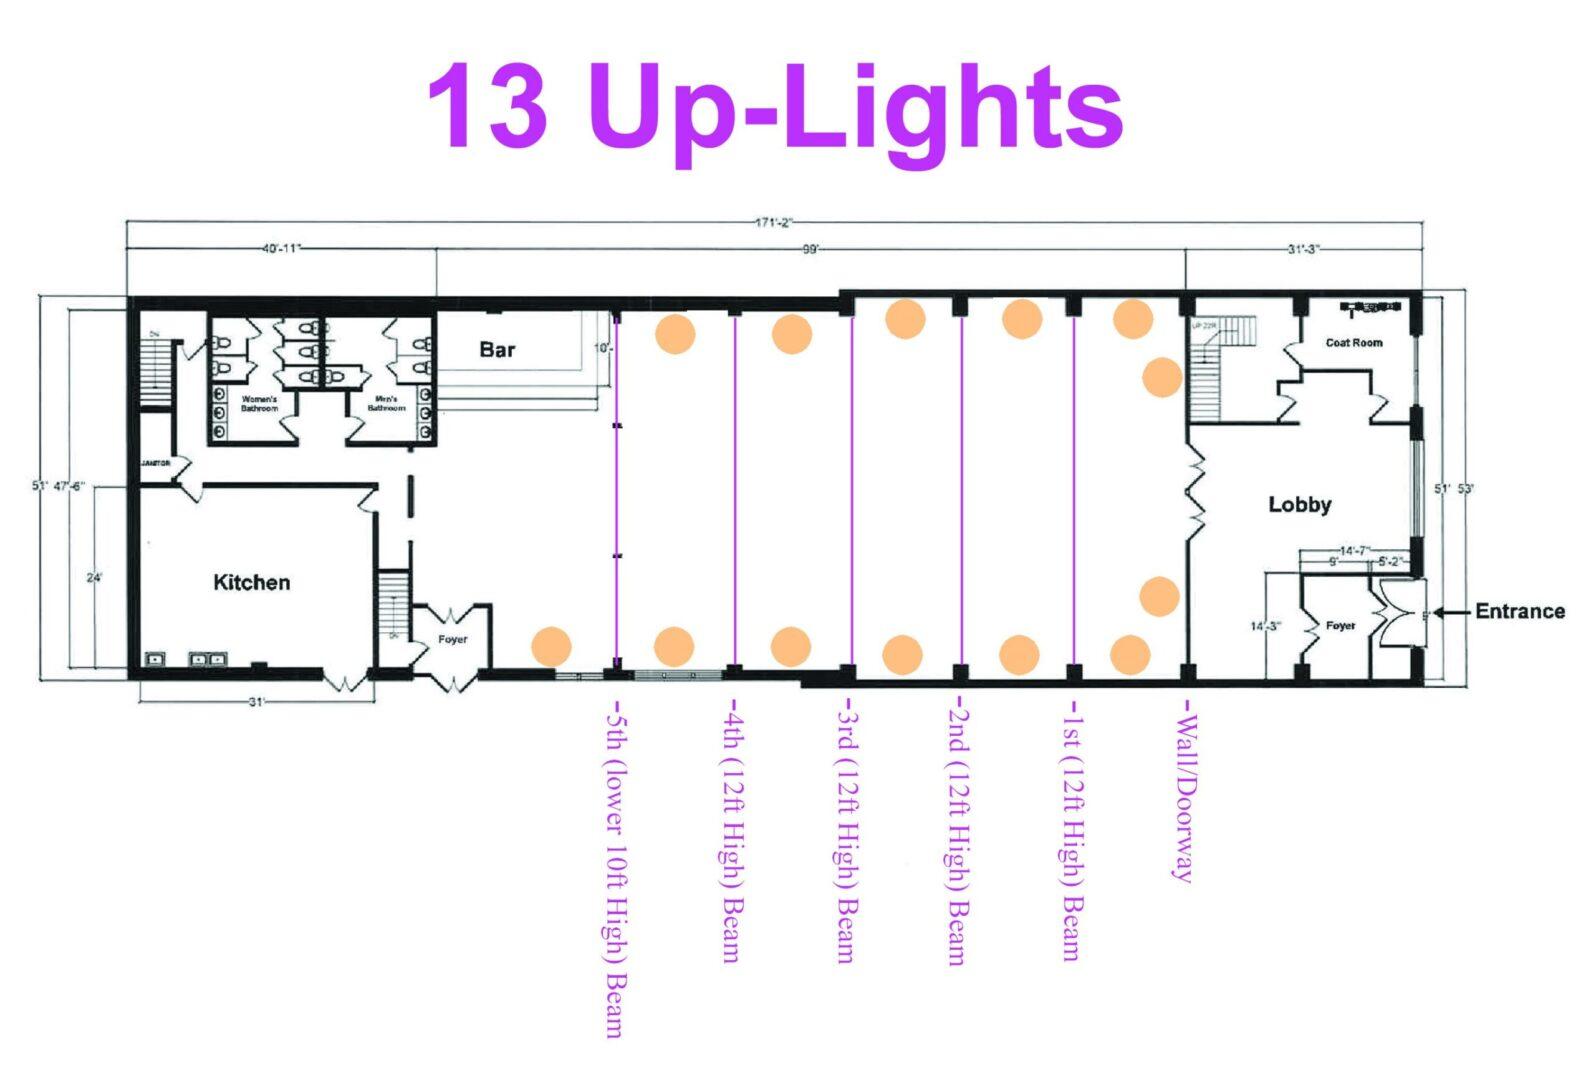 26 Bridge (13 Up-Lights)